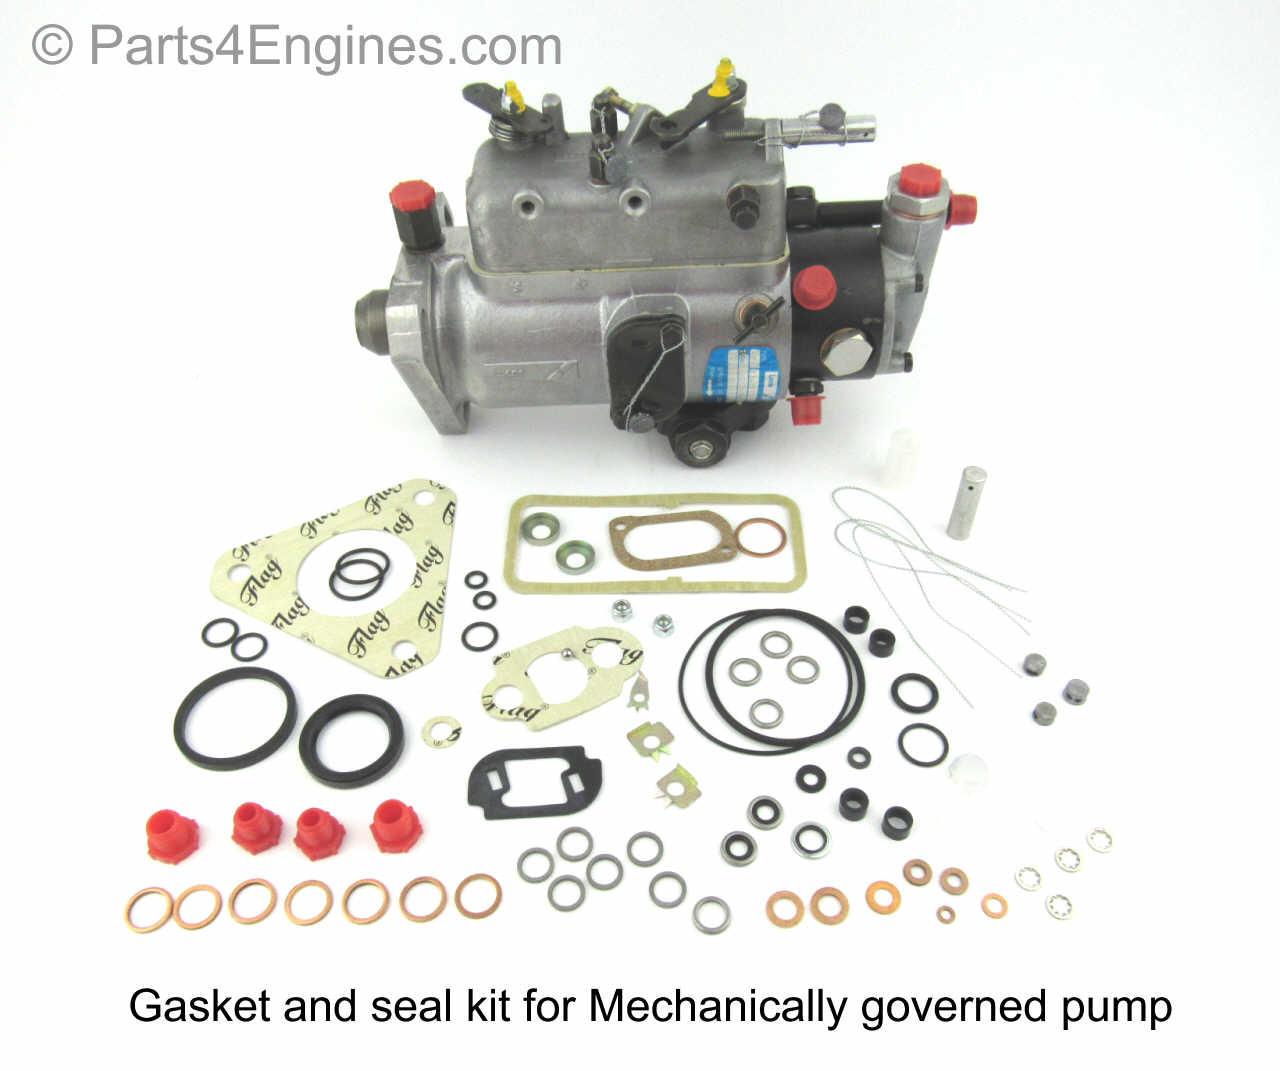 medium resolution of perkins 6 354 gasket seal kit for mechanical governed injection pump